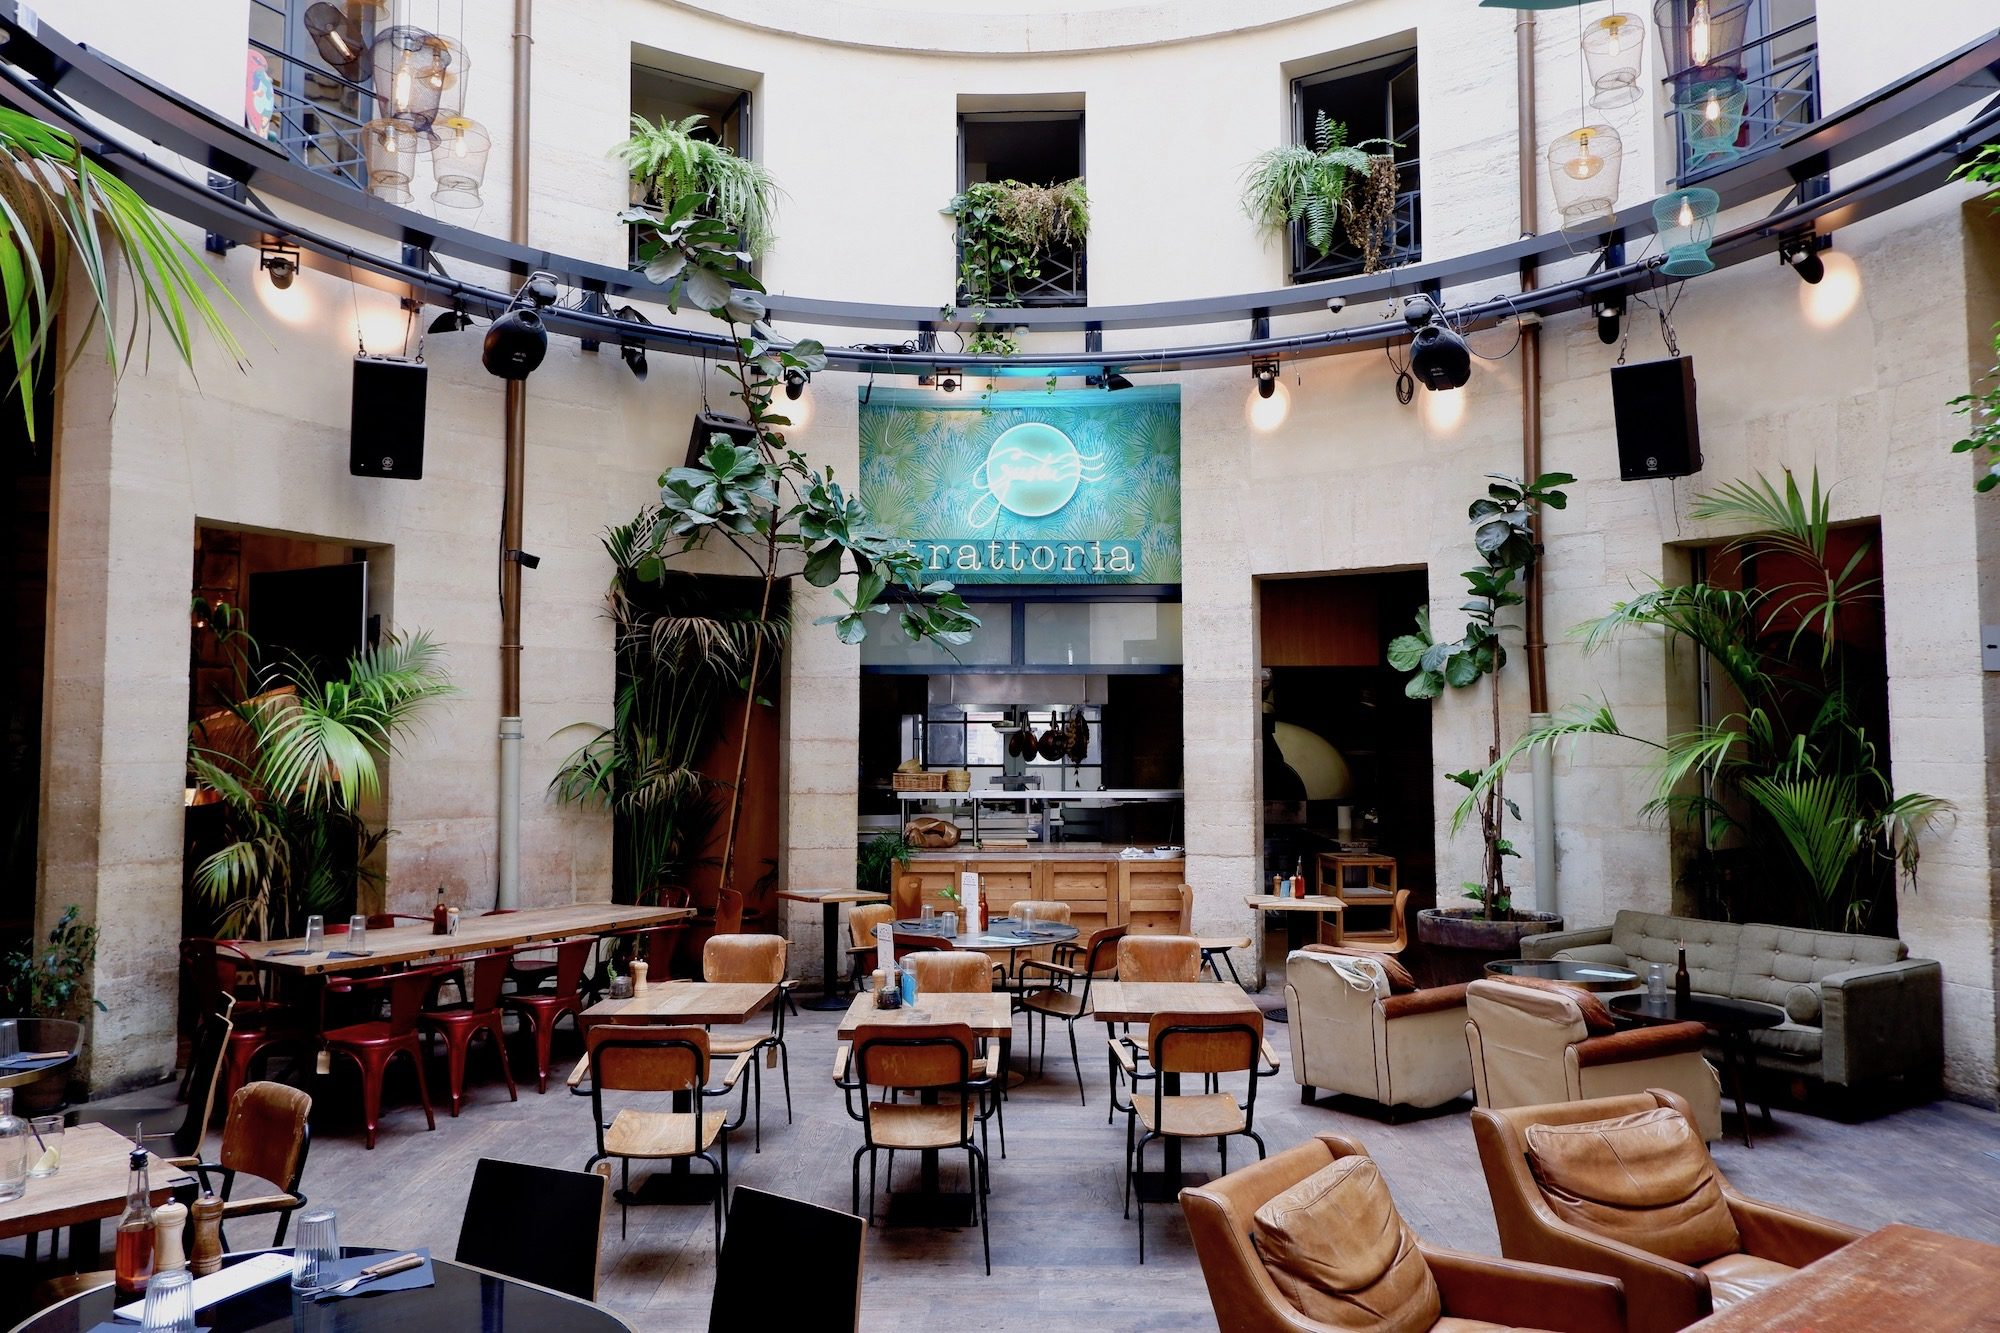 Inside La Rotonde bar, a popular bar close to the canal.